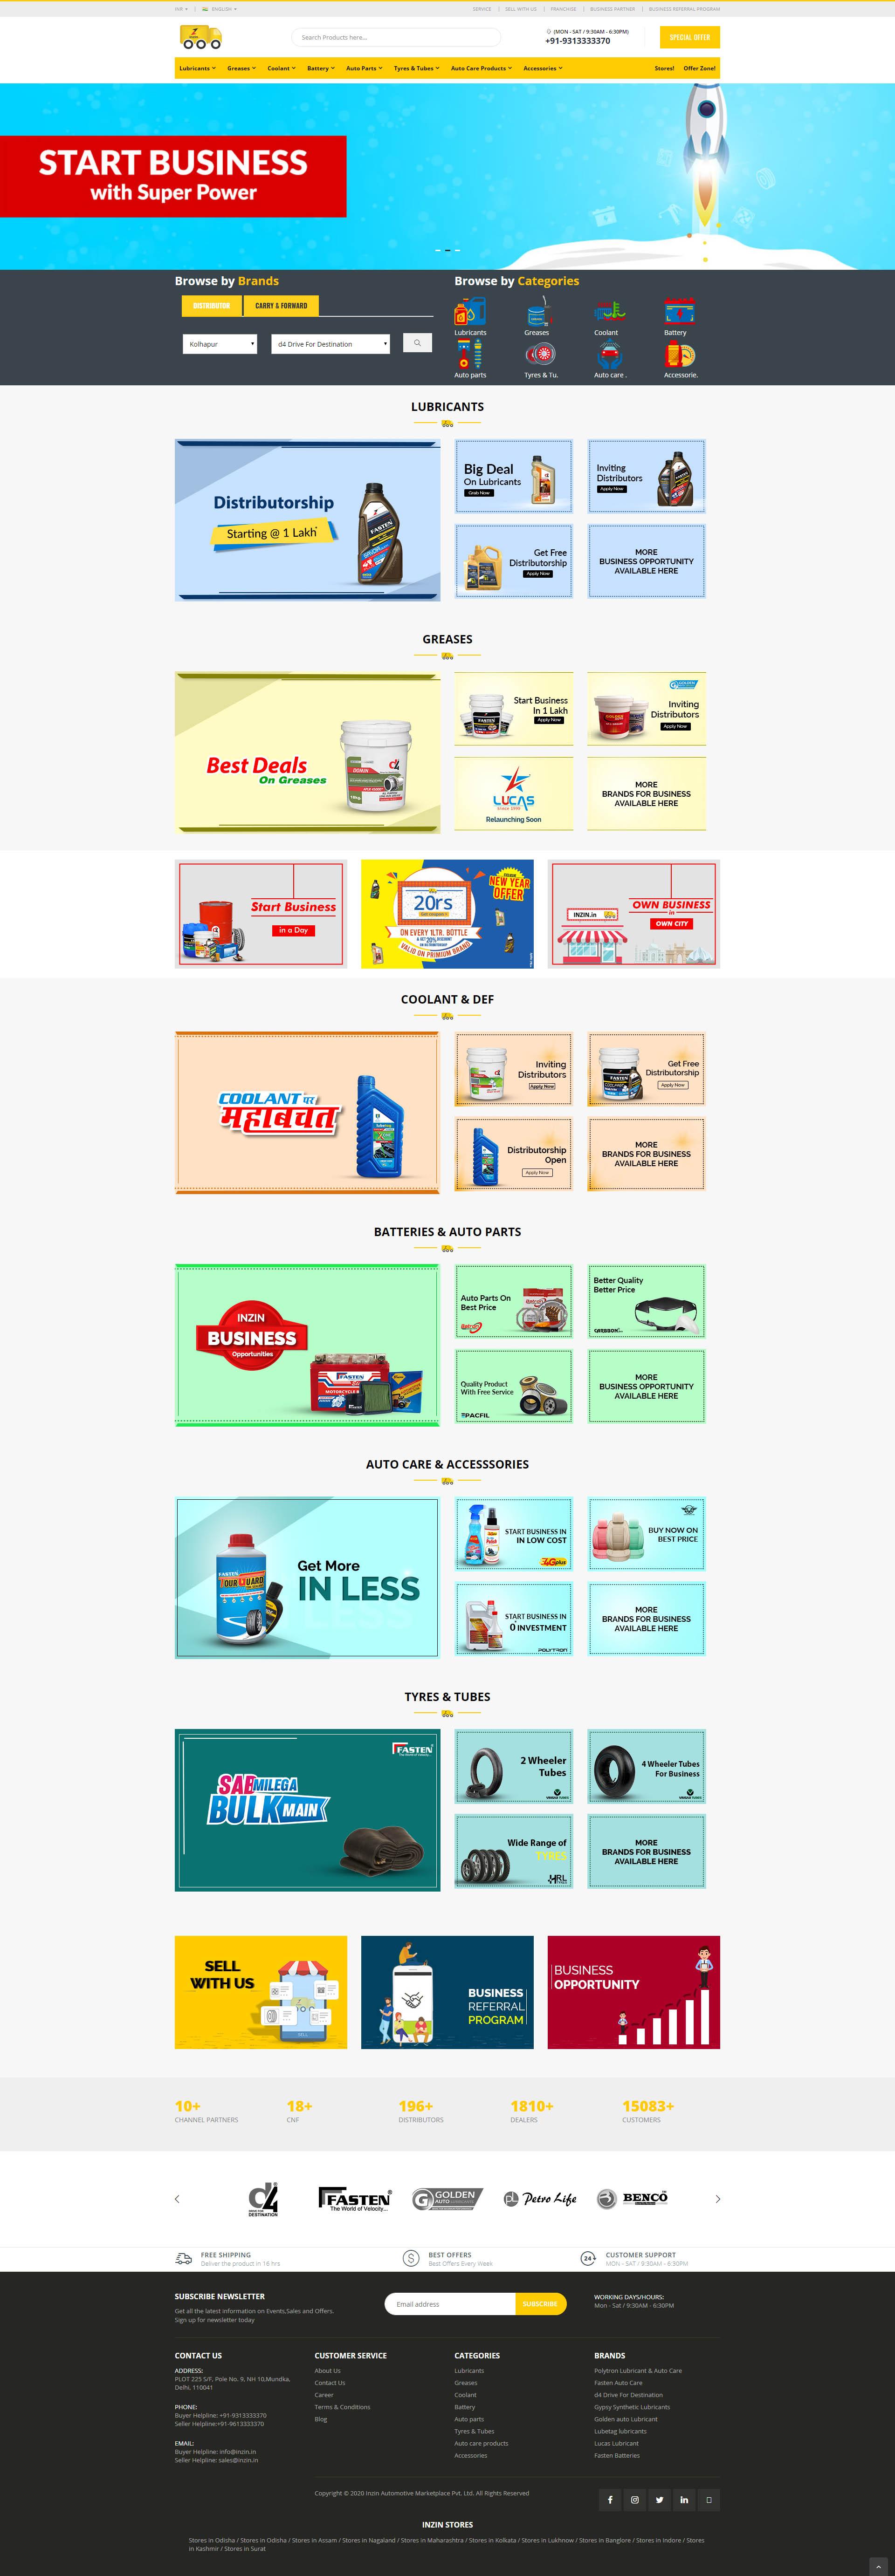 Previous Automotive Supplies Website Design Example